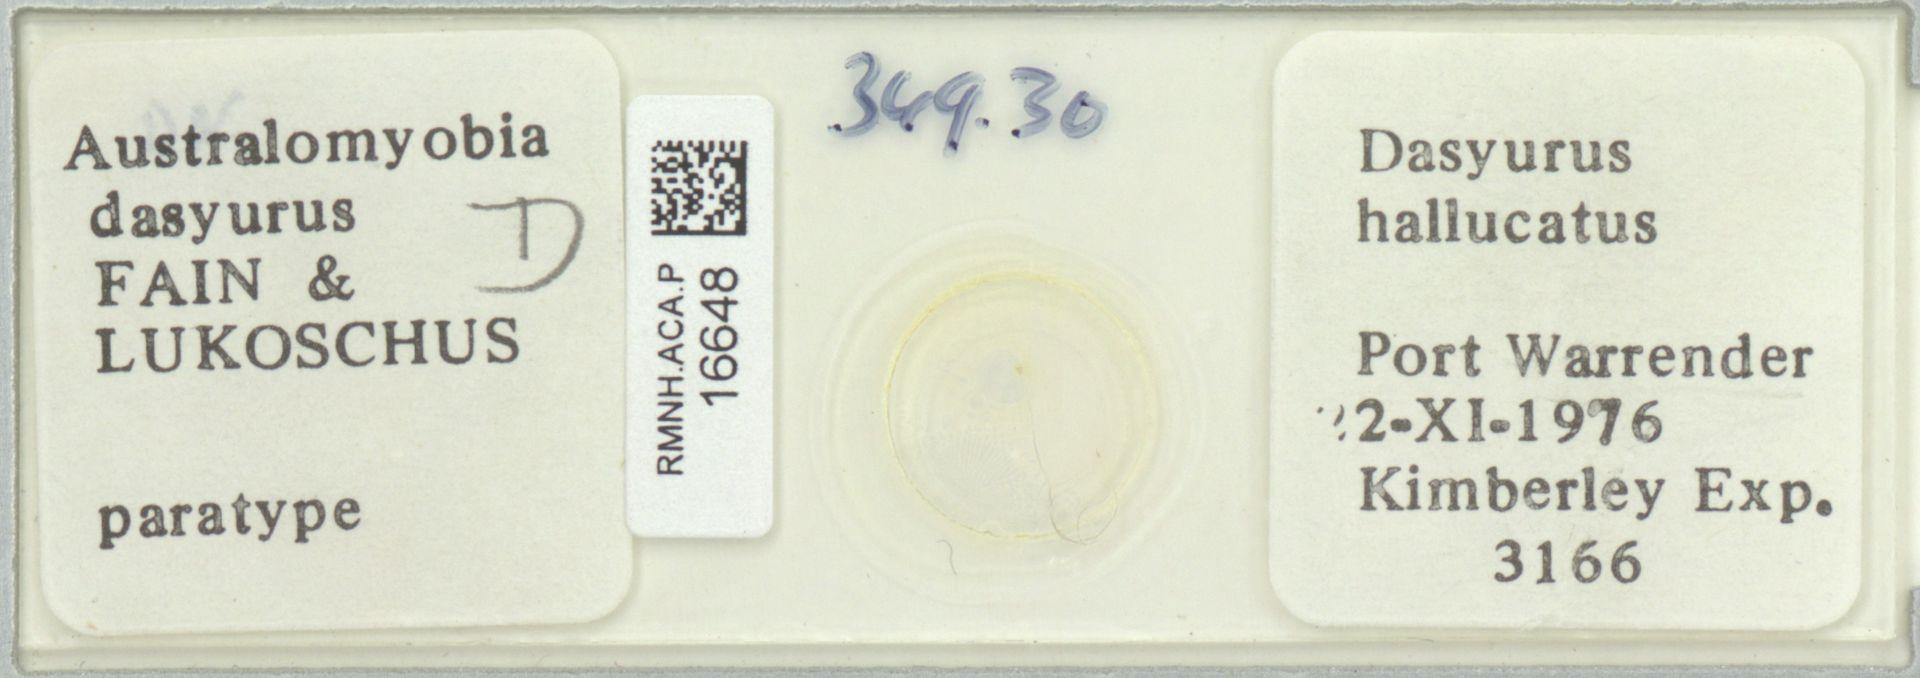 RMNH.ACA.P.16648 | Australomyobia dasyurus